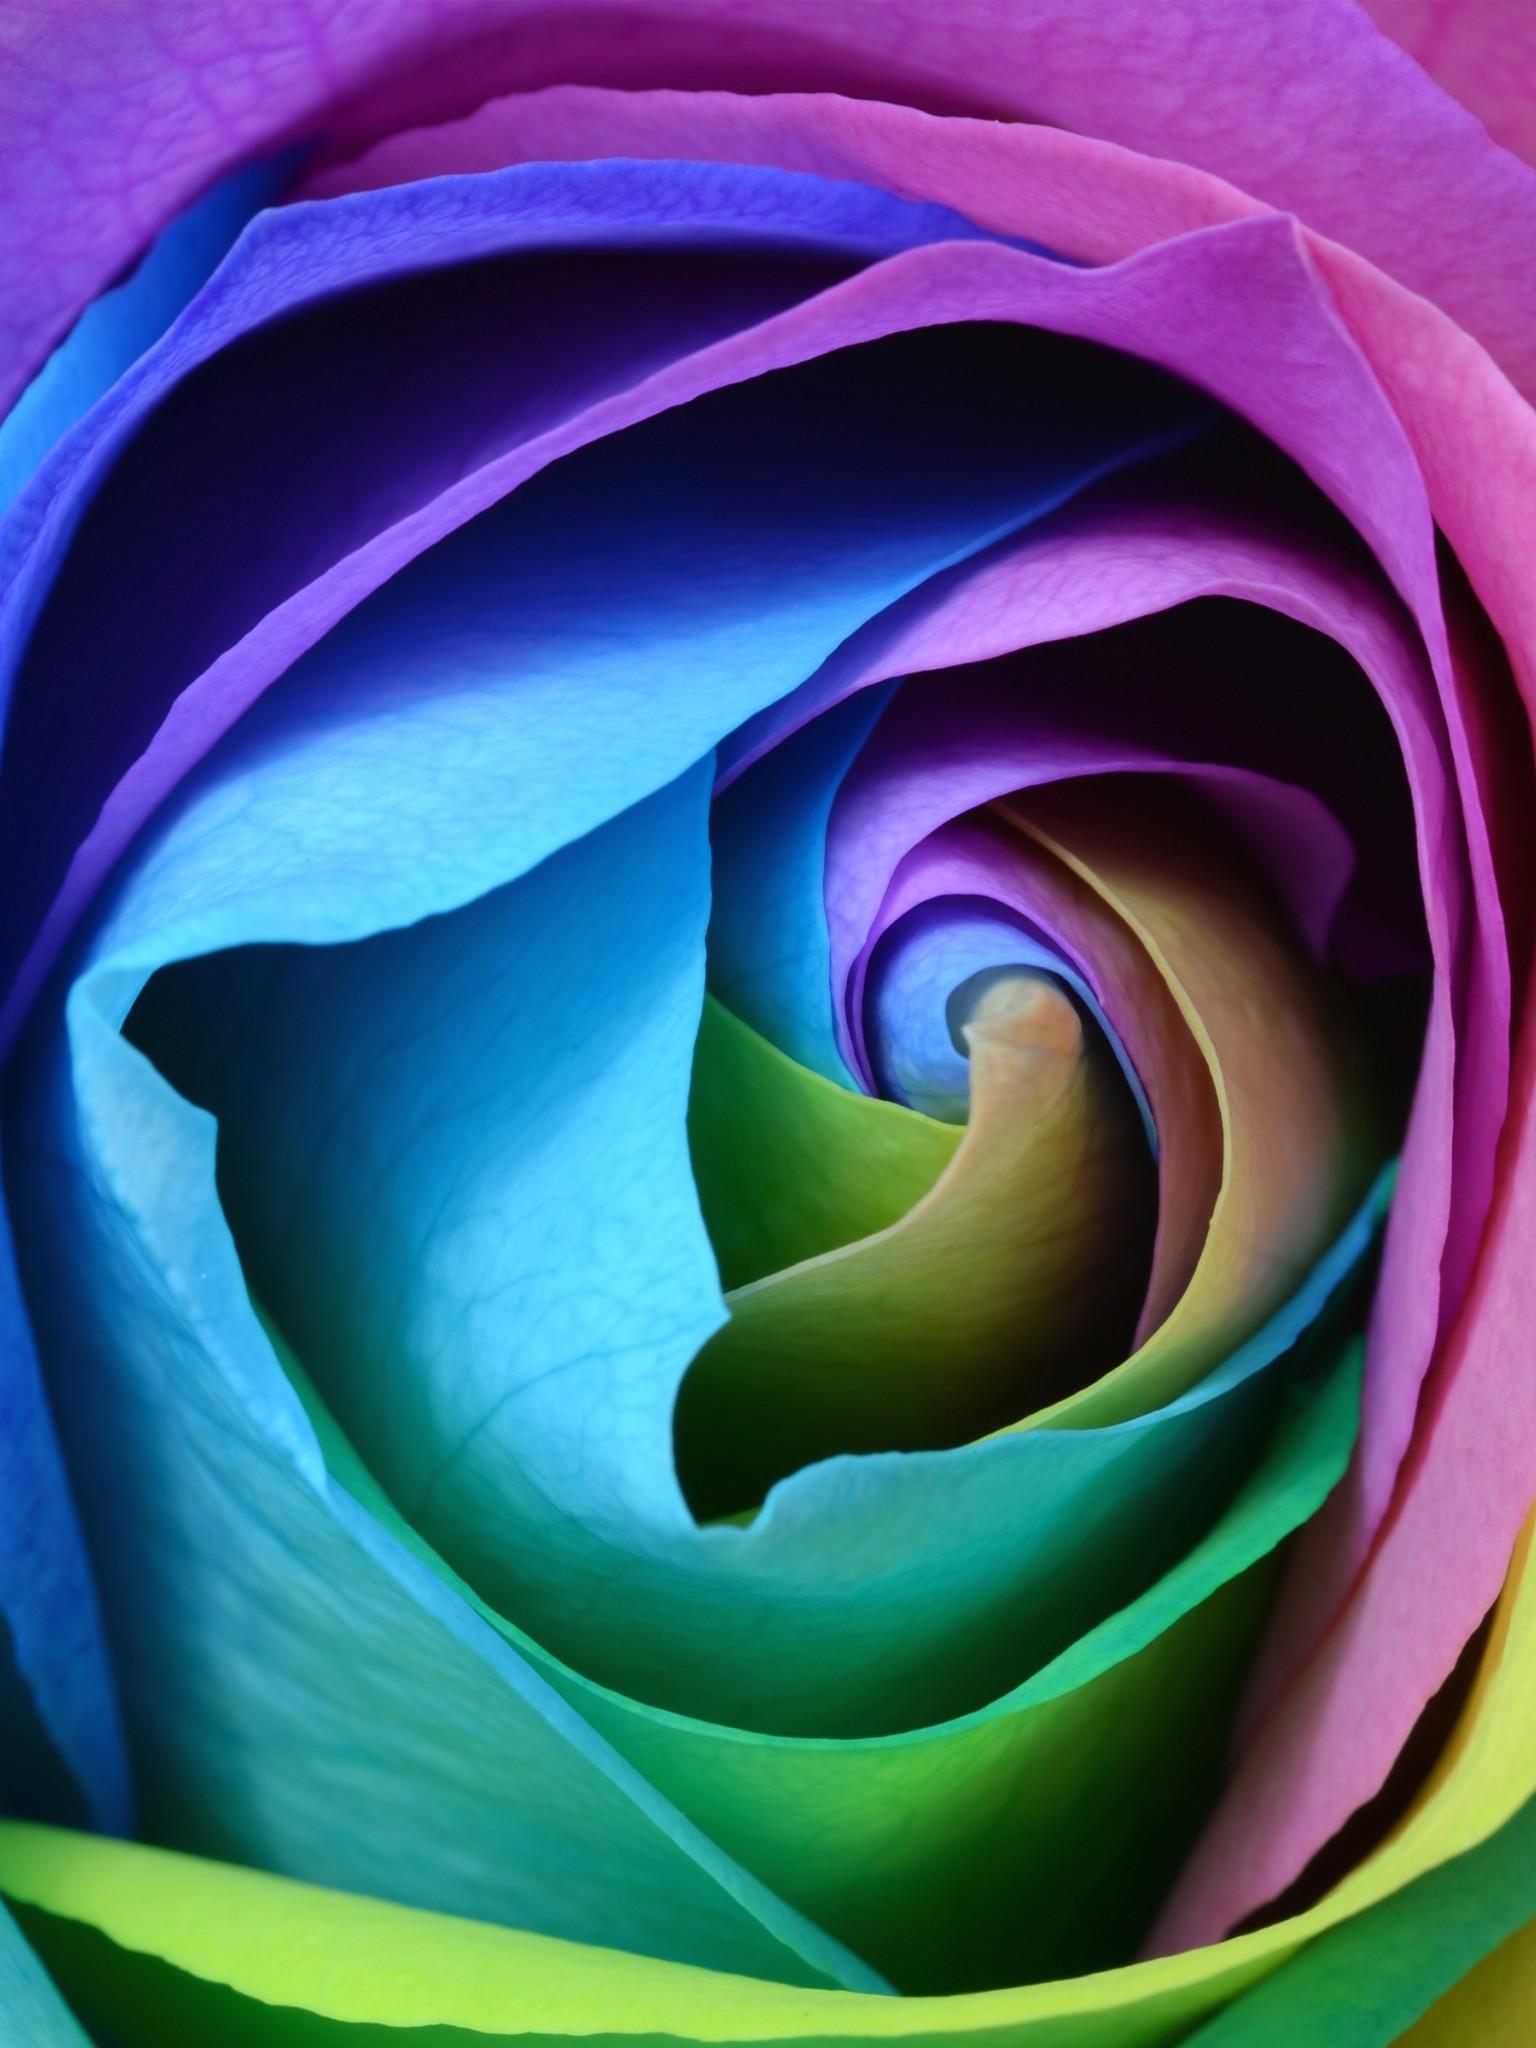 Download Free HD Beautiful Rose Flower Wallpaper Retina iPad